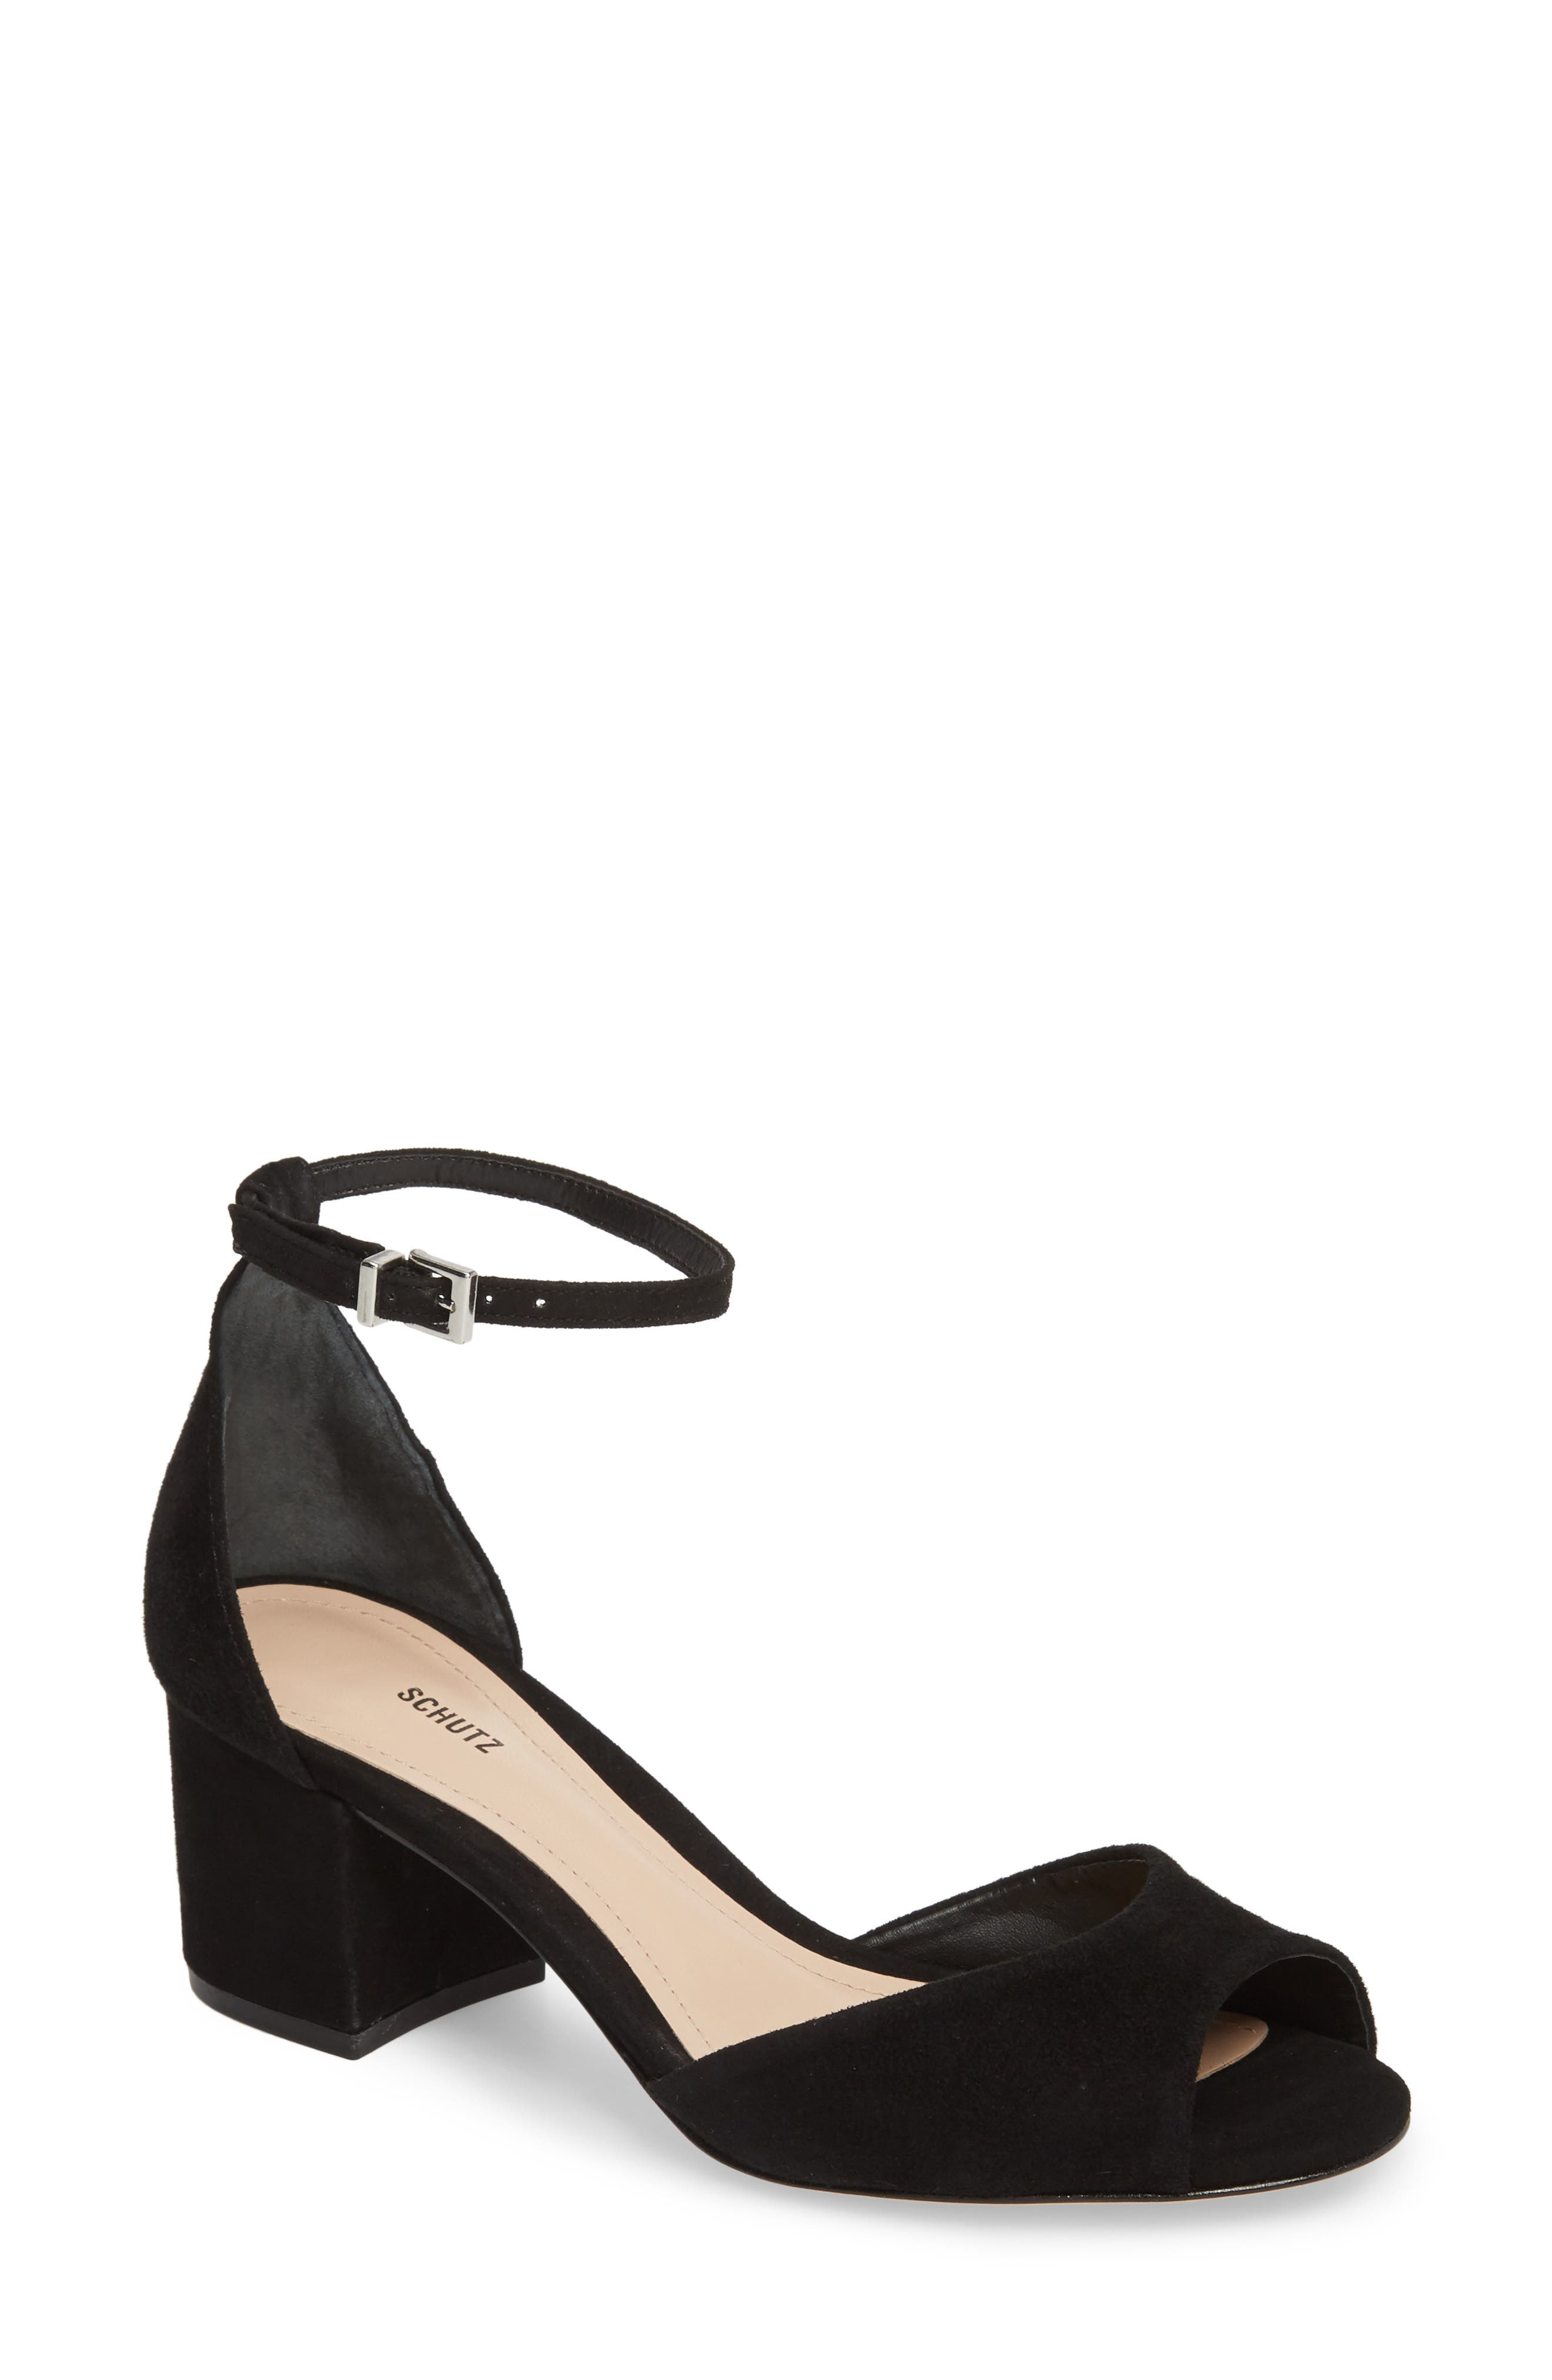 Sandals for Women On Sale, Dress Blue, Patent Leather, 2017, 3.5 8.5 Schutz